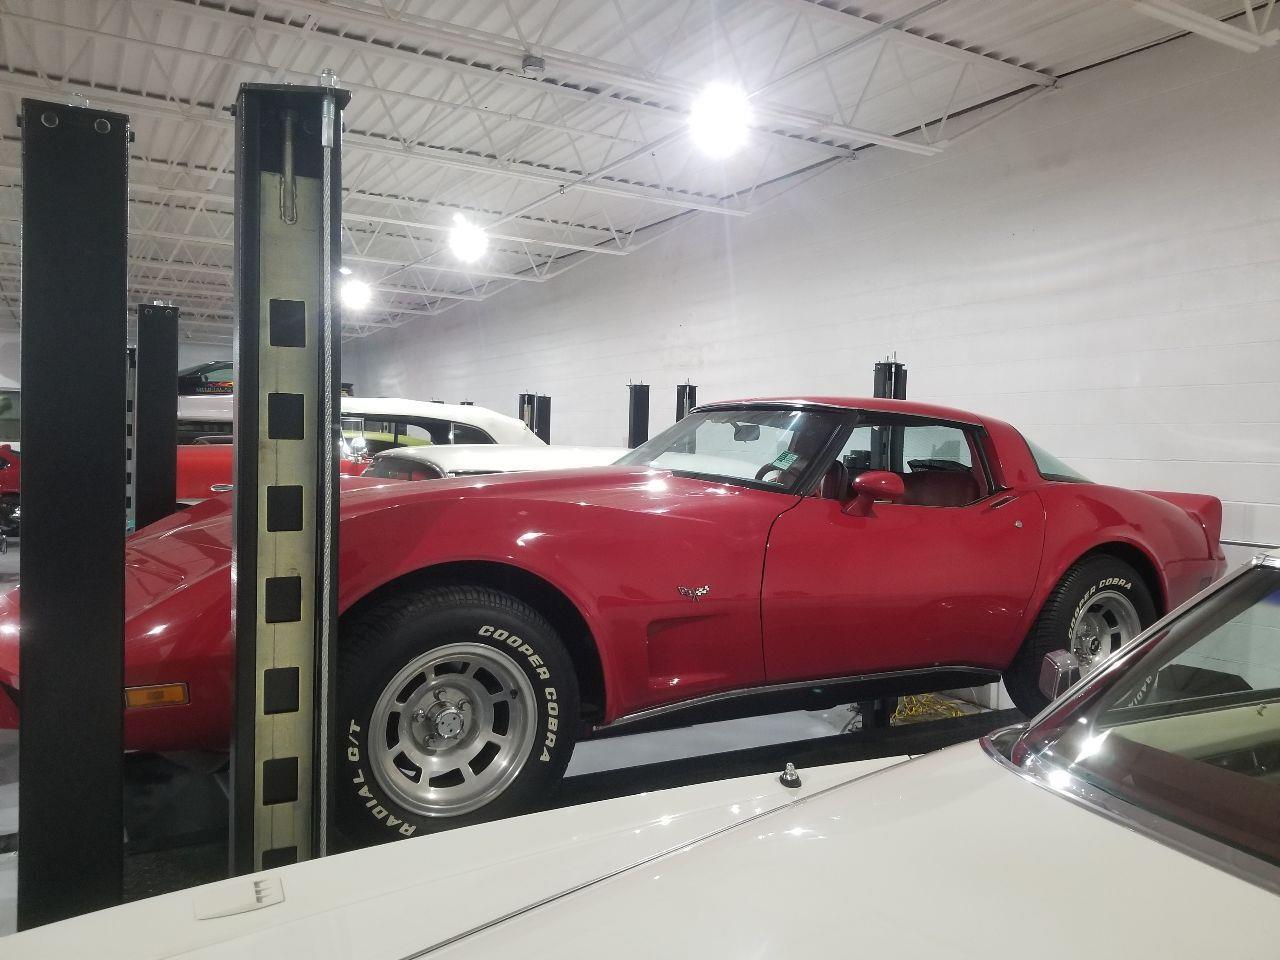 1979 Chevrolet Corvette (CC-1416357) for sale in Hilton, New York